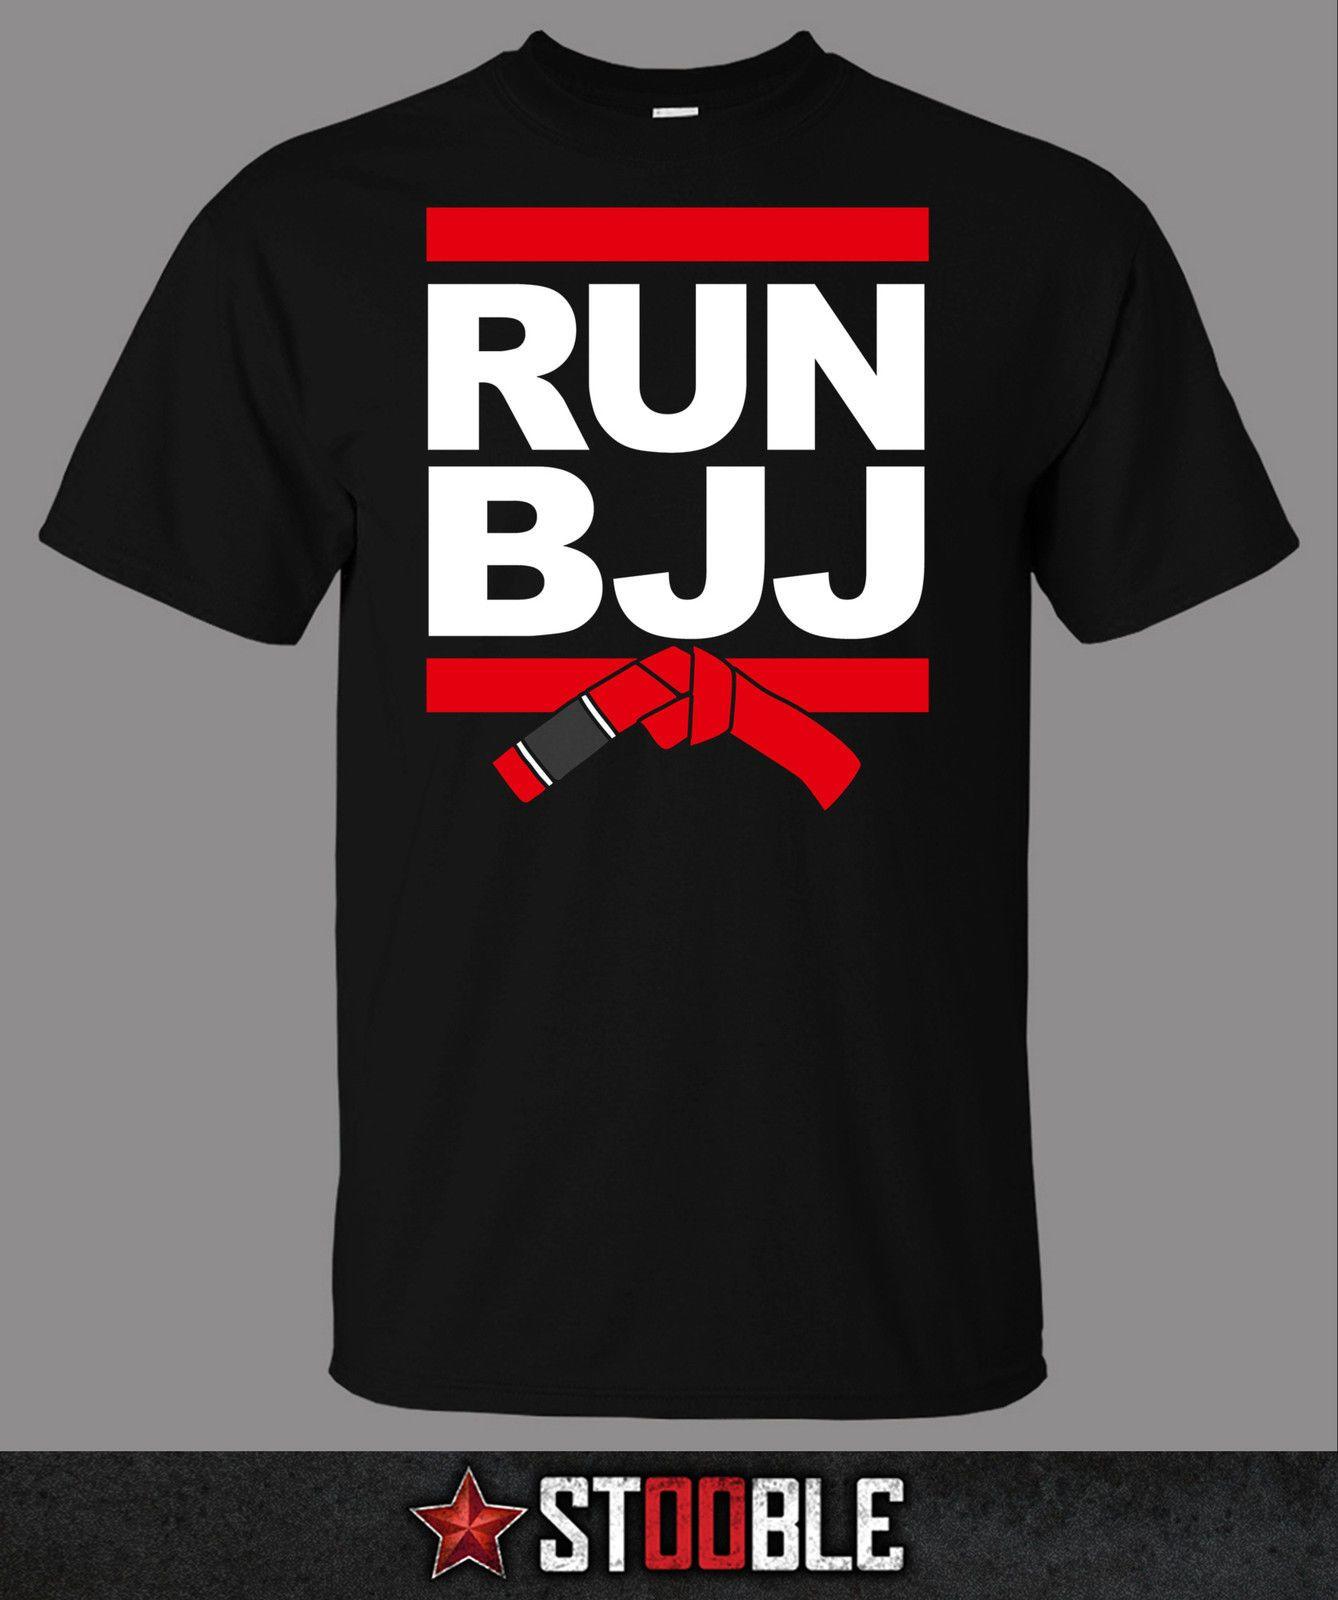 28df2f3ca Run BJJ Jiu Jitsu T Shirt Direct From Stockist Printing Tee Shirts Cool  Funny T Shirts From Xm24tshirt, $12.05| DHgate.Com